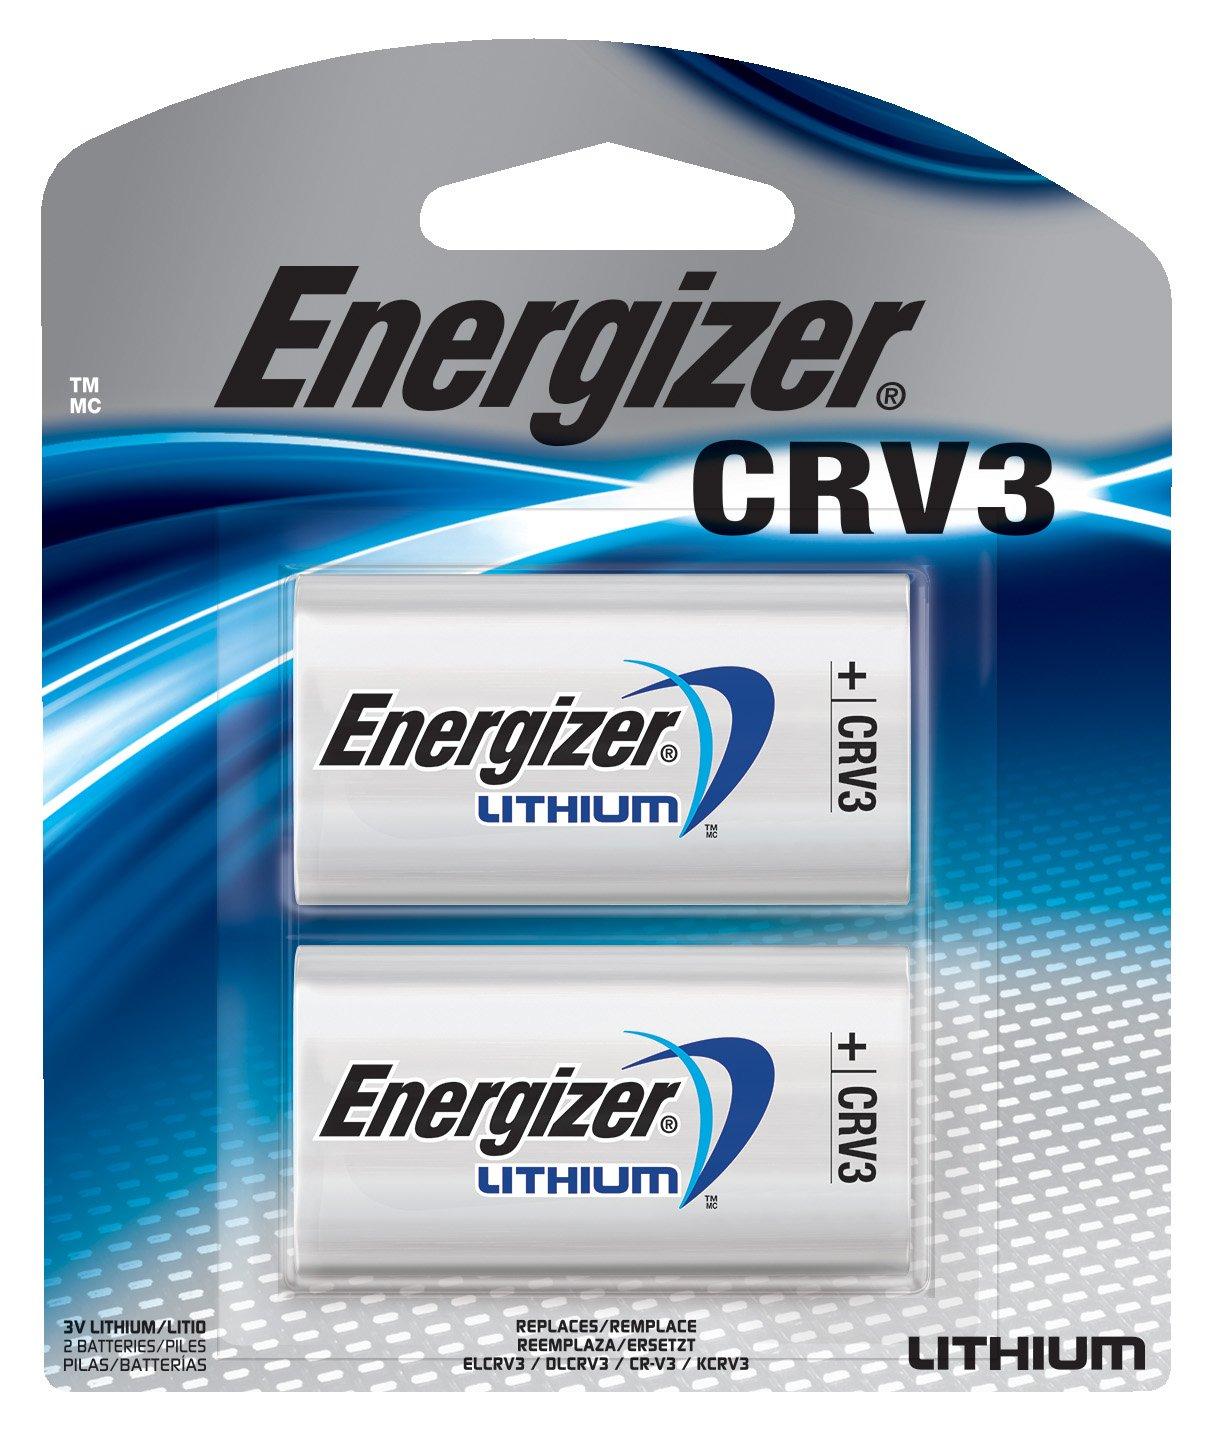 Energizer CRV3 Lithium Photo Batteries, 2-Pack